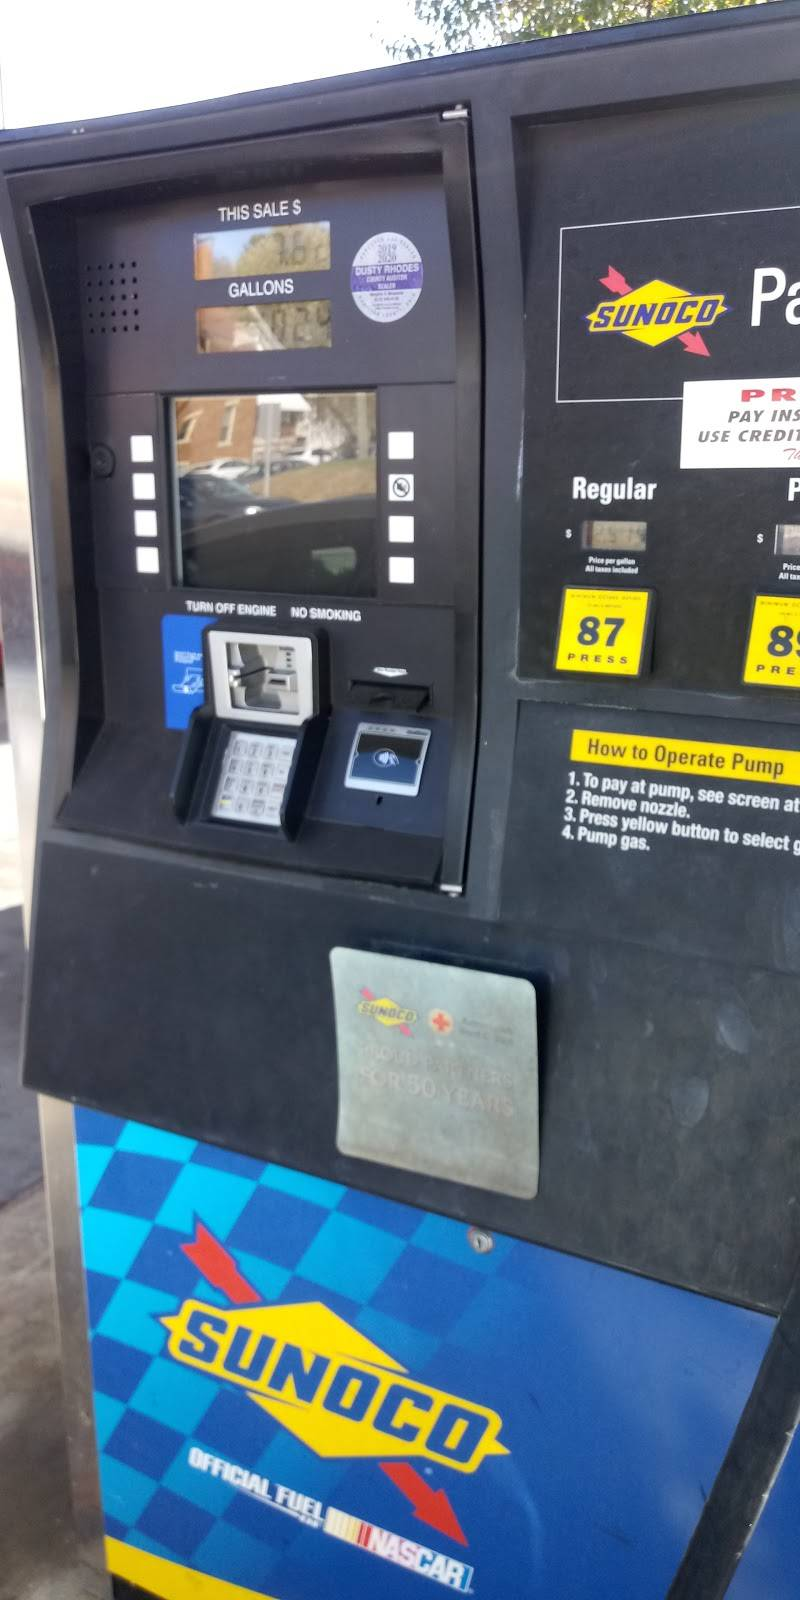 Sunoco Gas Station - gas station  | Photo 2 of 3 | Address: 2265 Norwood Ave, Cincinnati, OH 45212, USA | Phone: (513) 531-7421